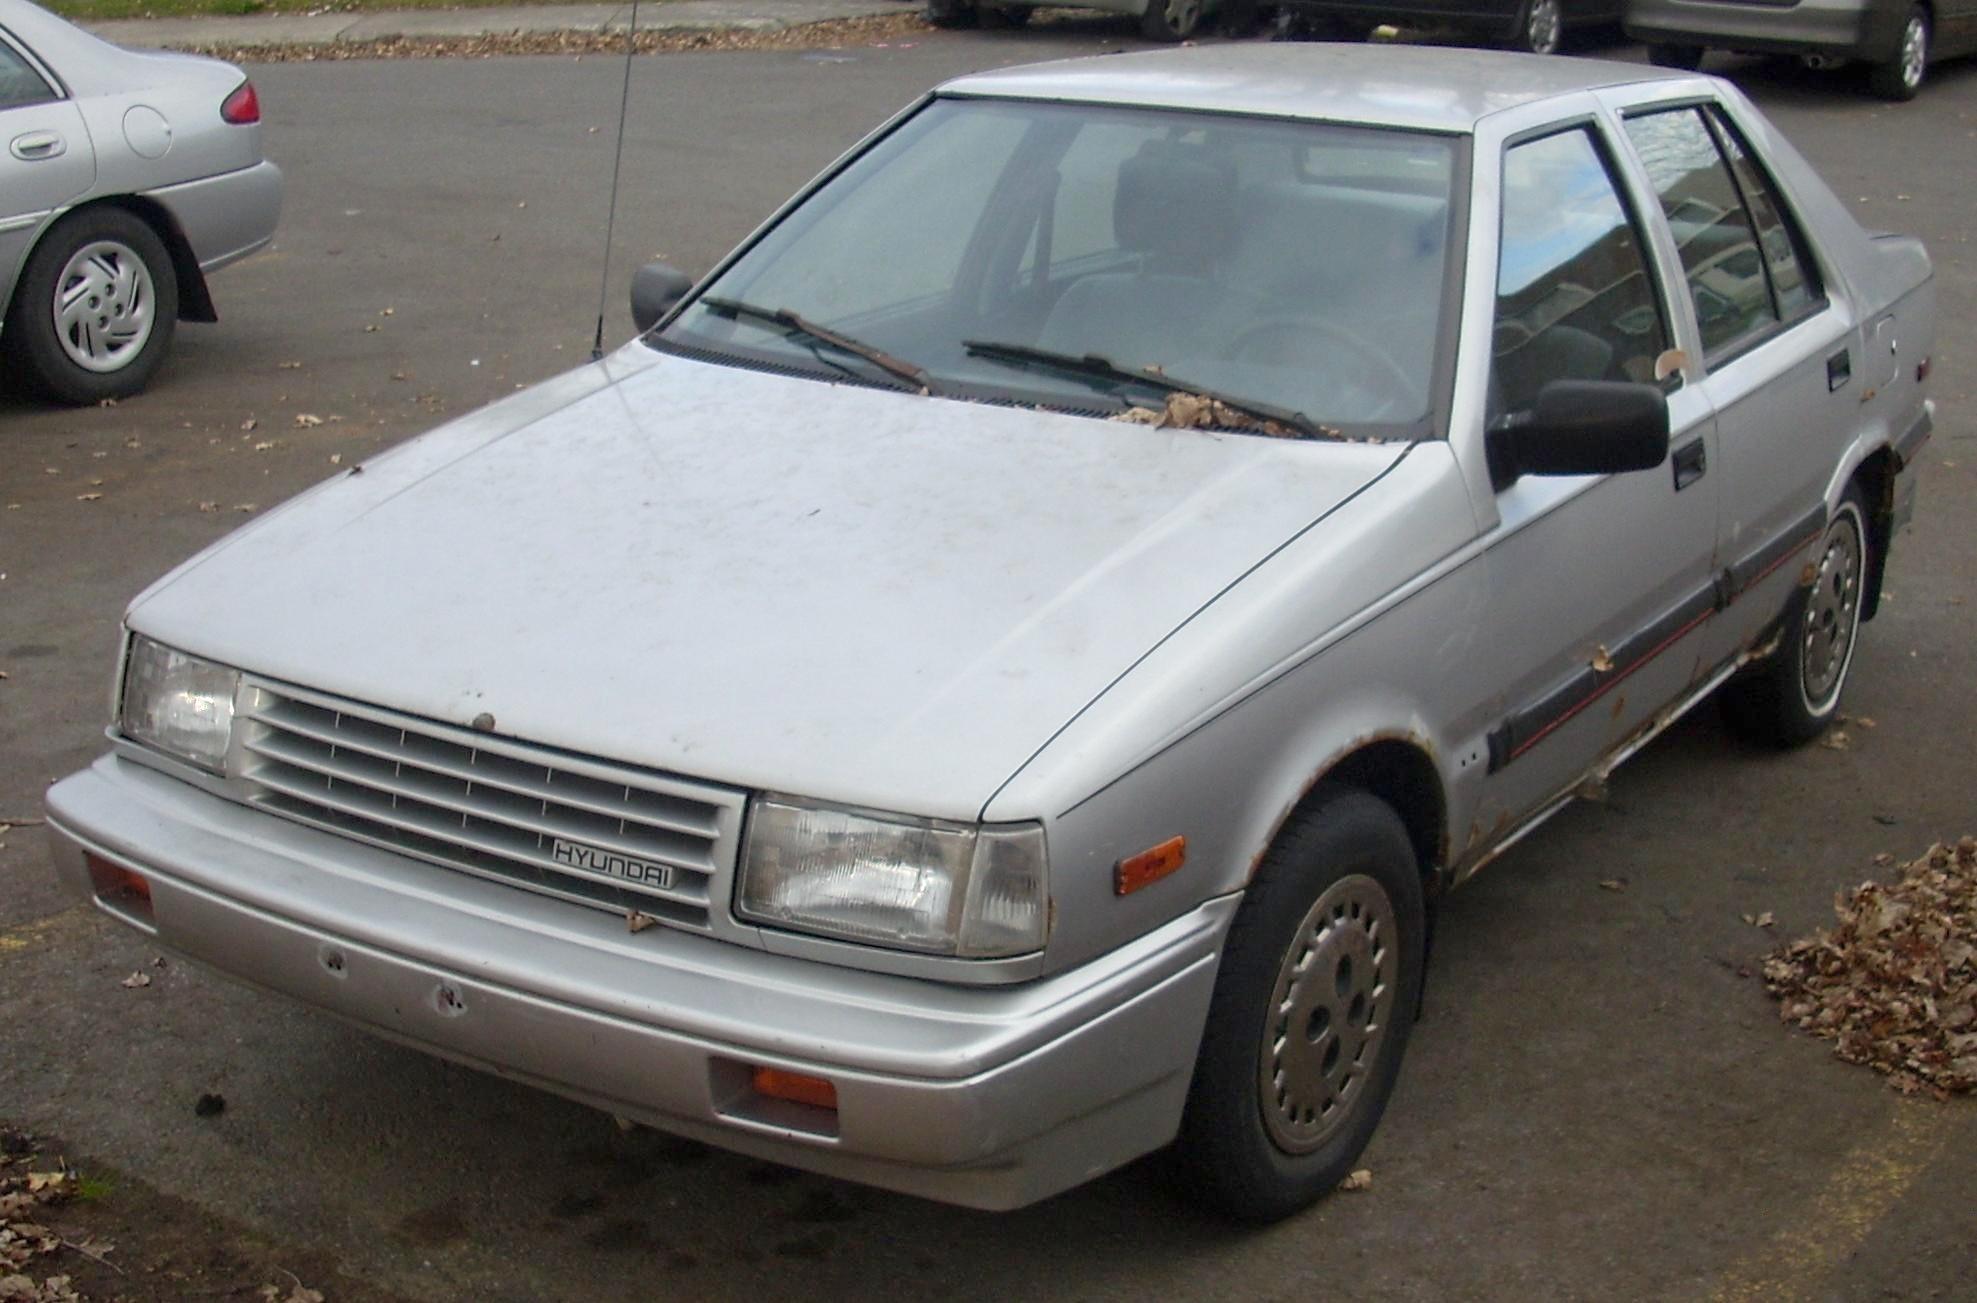 File:'88-'89 Hyundai Excel Sedan.jpg - Wikimedia Commons